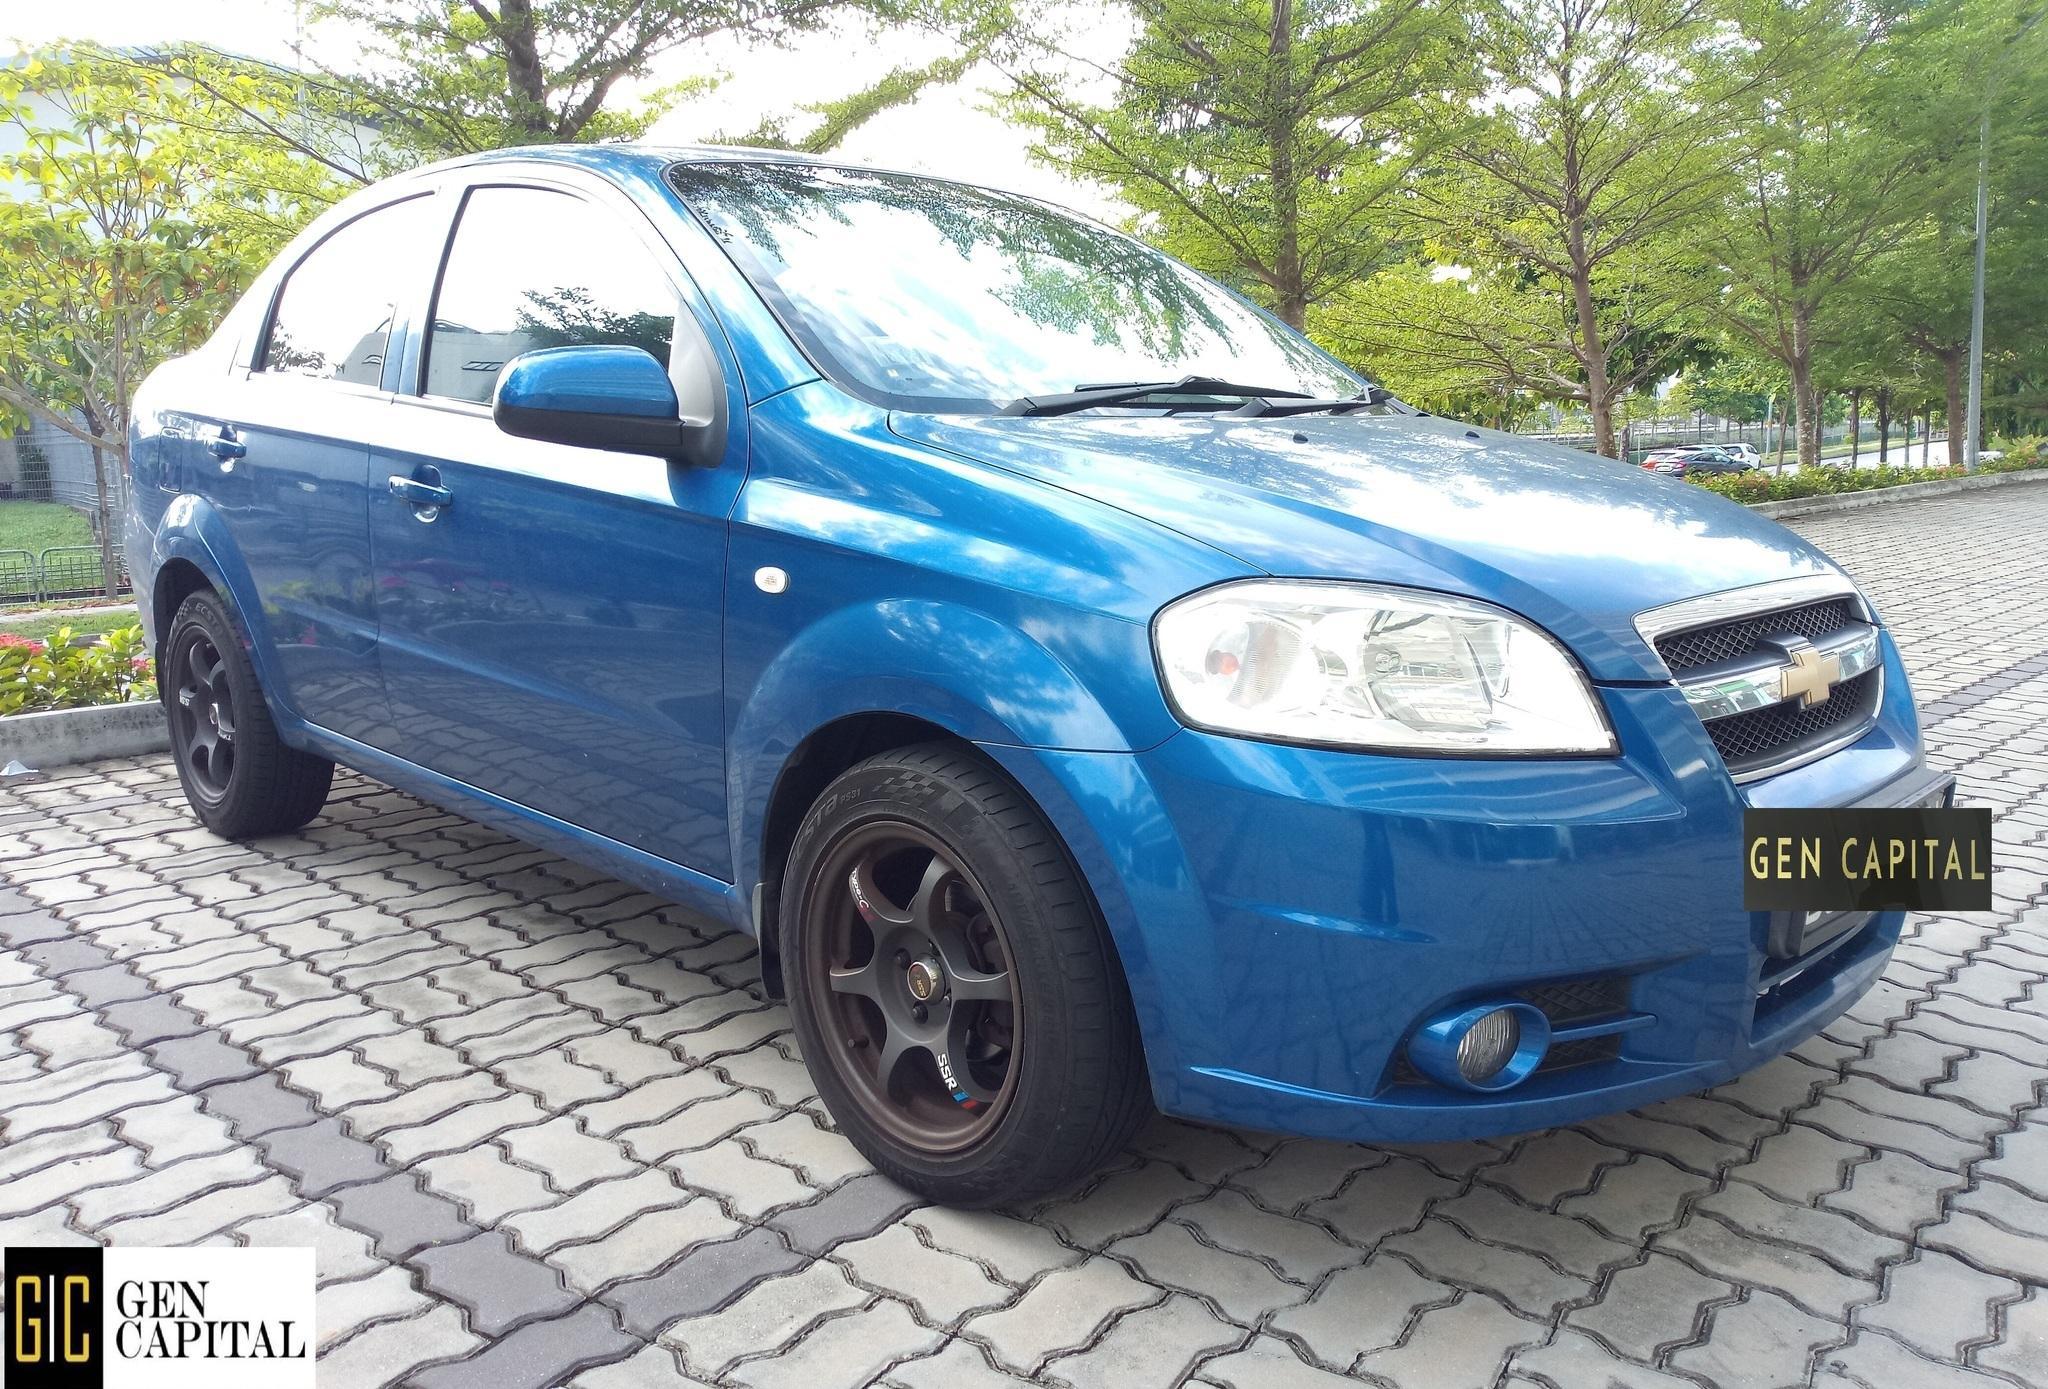 Chevrolet AVEO 1.4A Grab Gojek Ryde Tada Friendly & Non PHV Car Rental